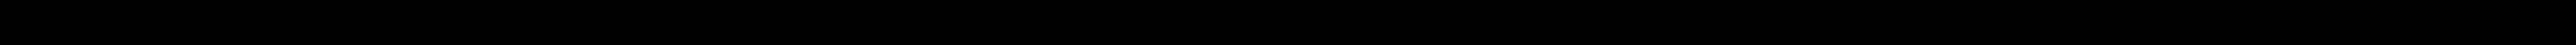 {\displaystyle \cup \{(x,y)|y=-(2.6^{2}-x^{2})^{\frac {1}{2}}\}\cup \{(x,y)|y=0.34(2.6^{2}-x^{2})^{\frac {1}{2}},x\in [-2.6,-2.4]\cup [2.4,2.6]\}\cup \{(x,y)|y=(0.5-(x+2.5)^{2})^{\frac {1}{2}}+1.6,x\in [-\infty ,-2.1]\cup [2.1,\infty ]\}\cup \{(x,y)|y=-(0.5-(x+2.5)^{2})^{\frac {1}{2}}+1.6,x\in [-\infty ,-2.85]\cup [2.85,\infty ]\}}